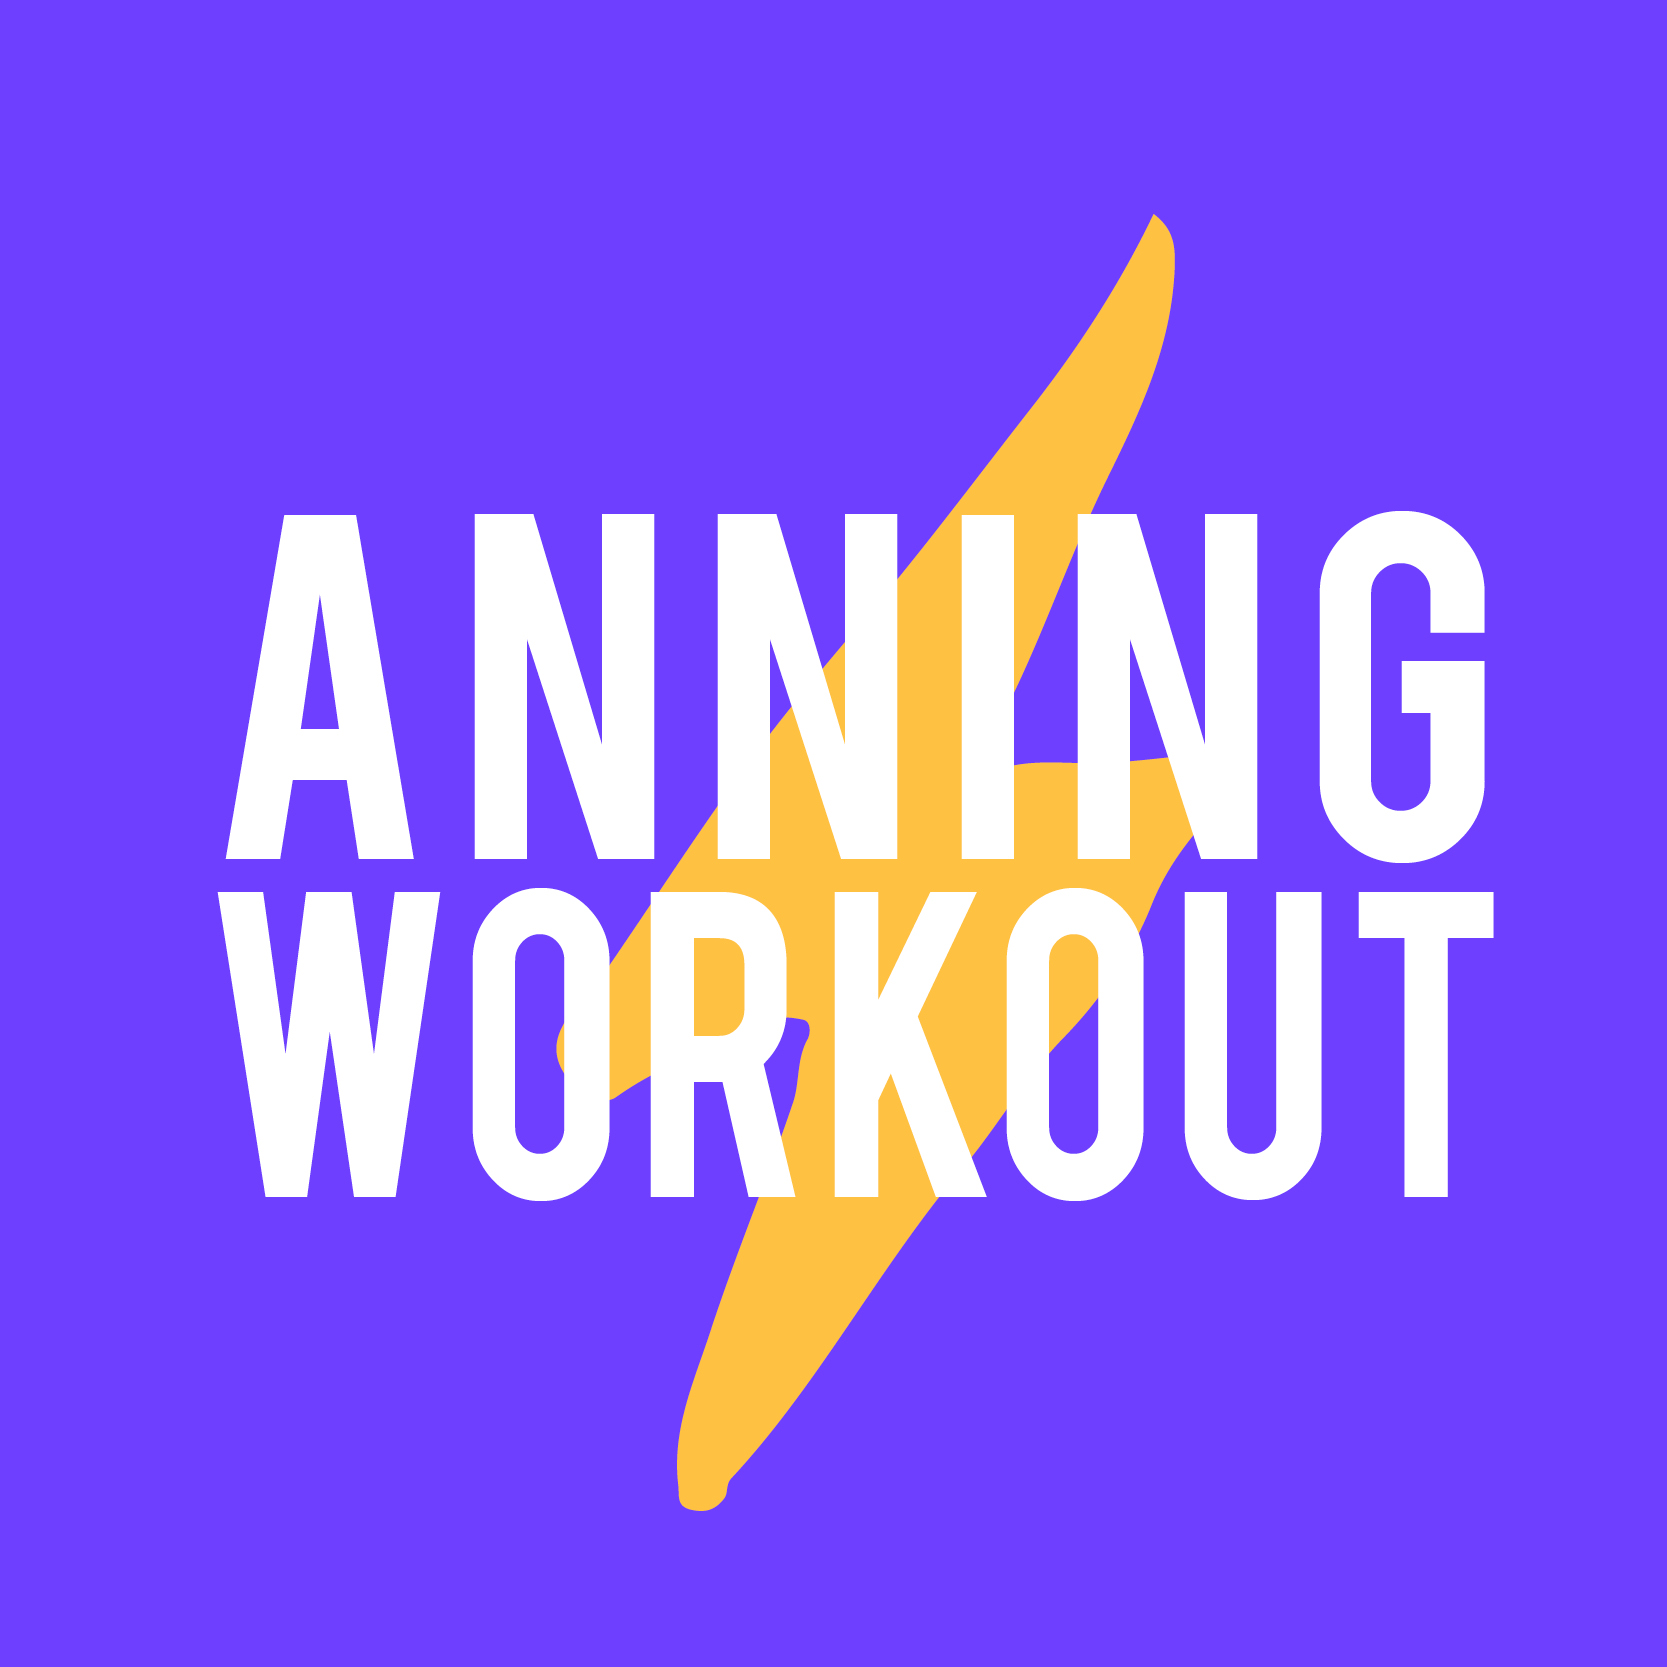 anning workout.jpg